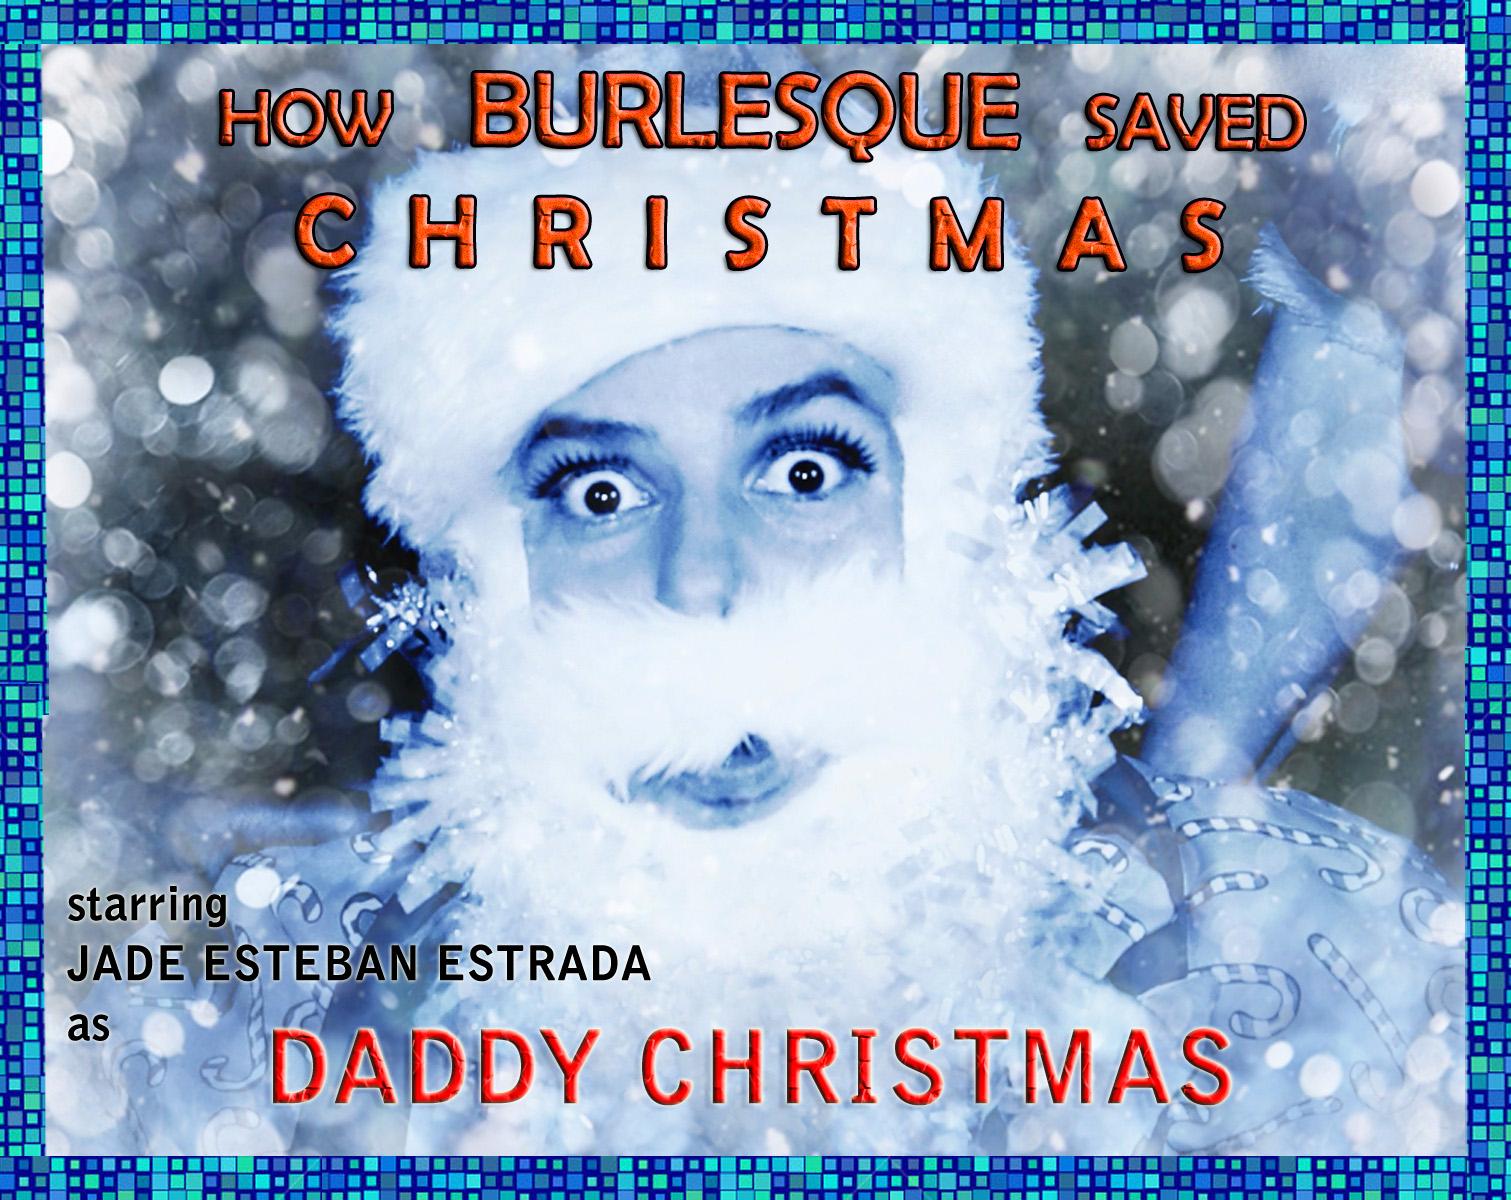 daddychristmas300